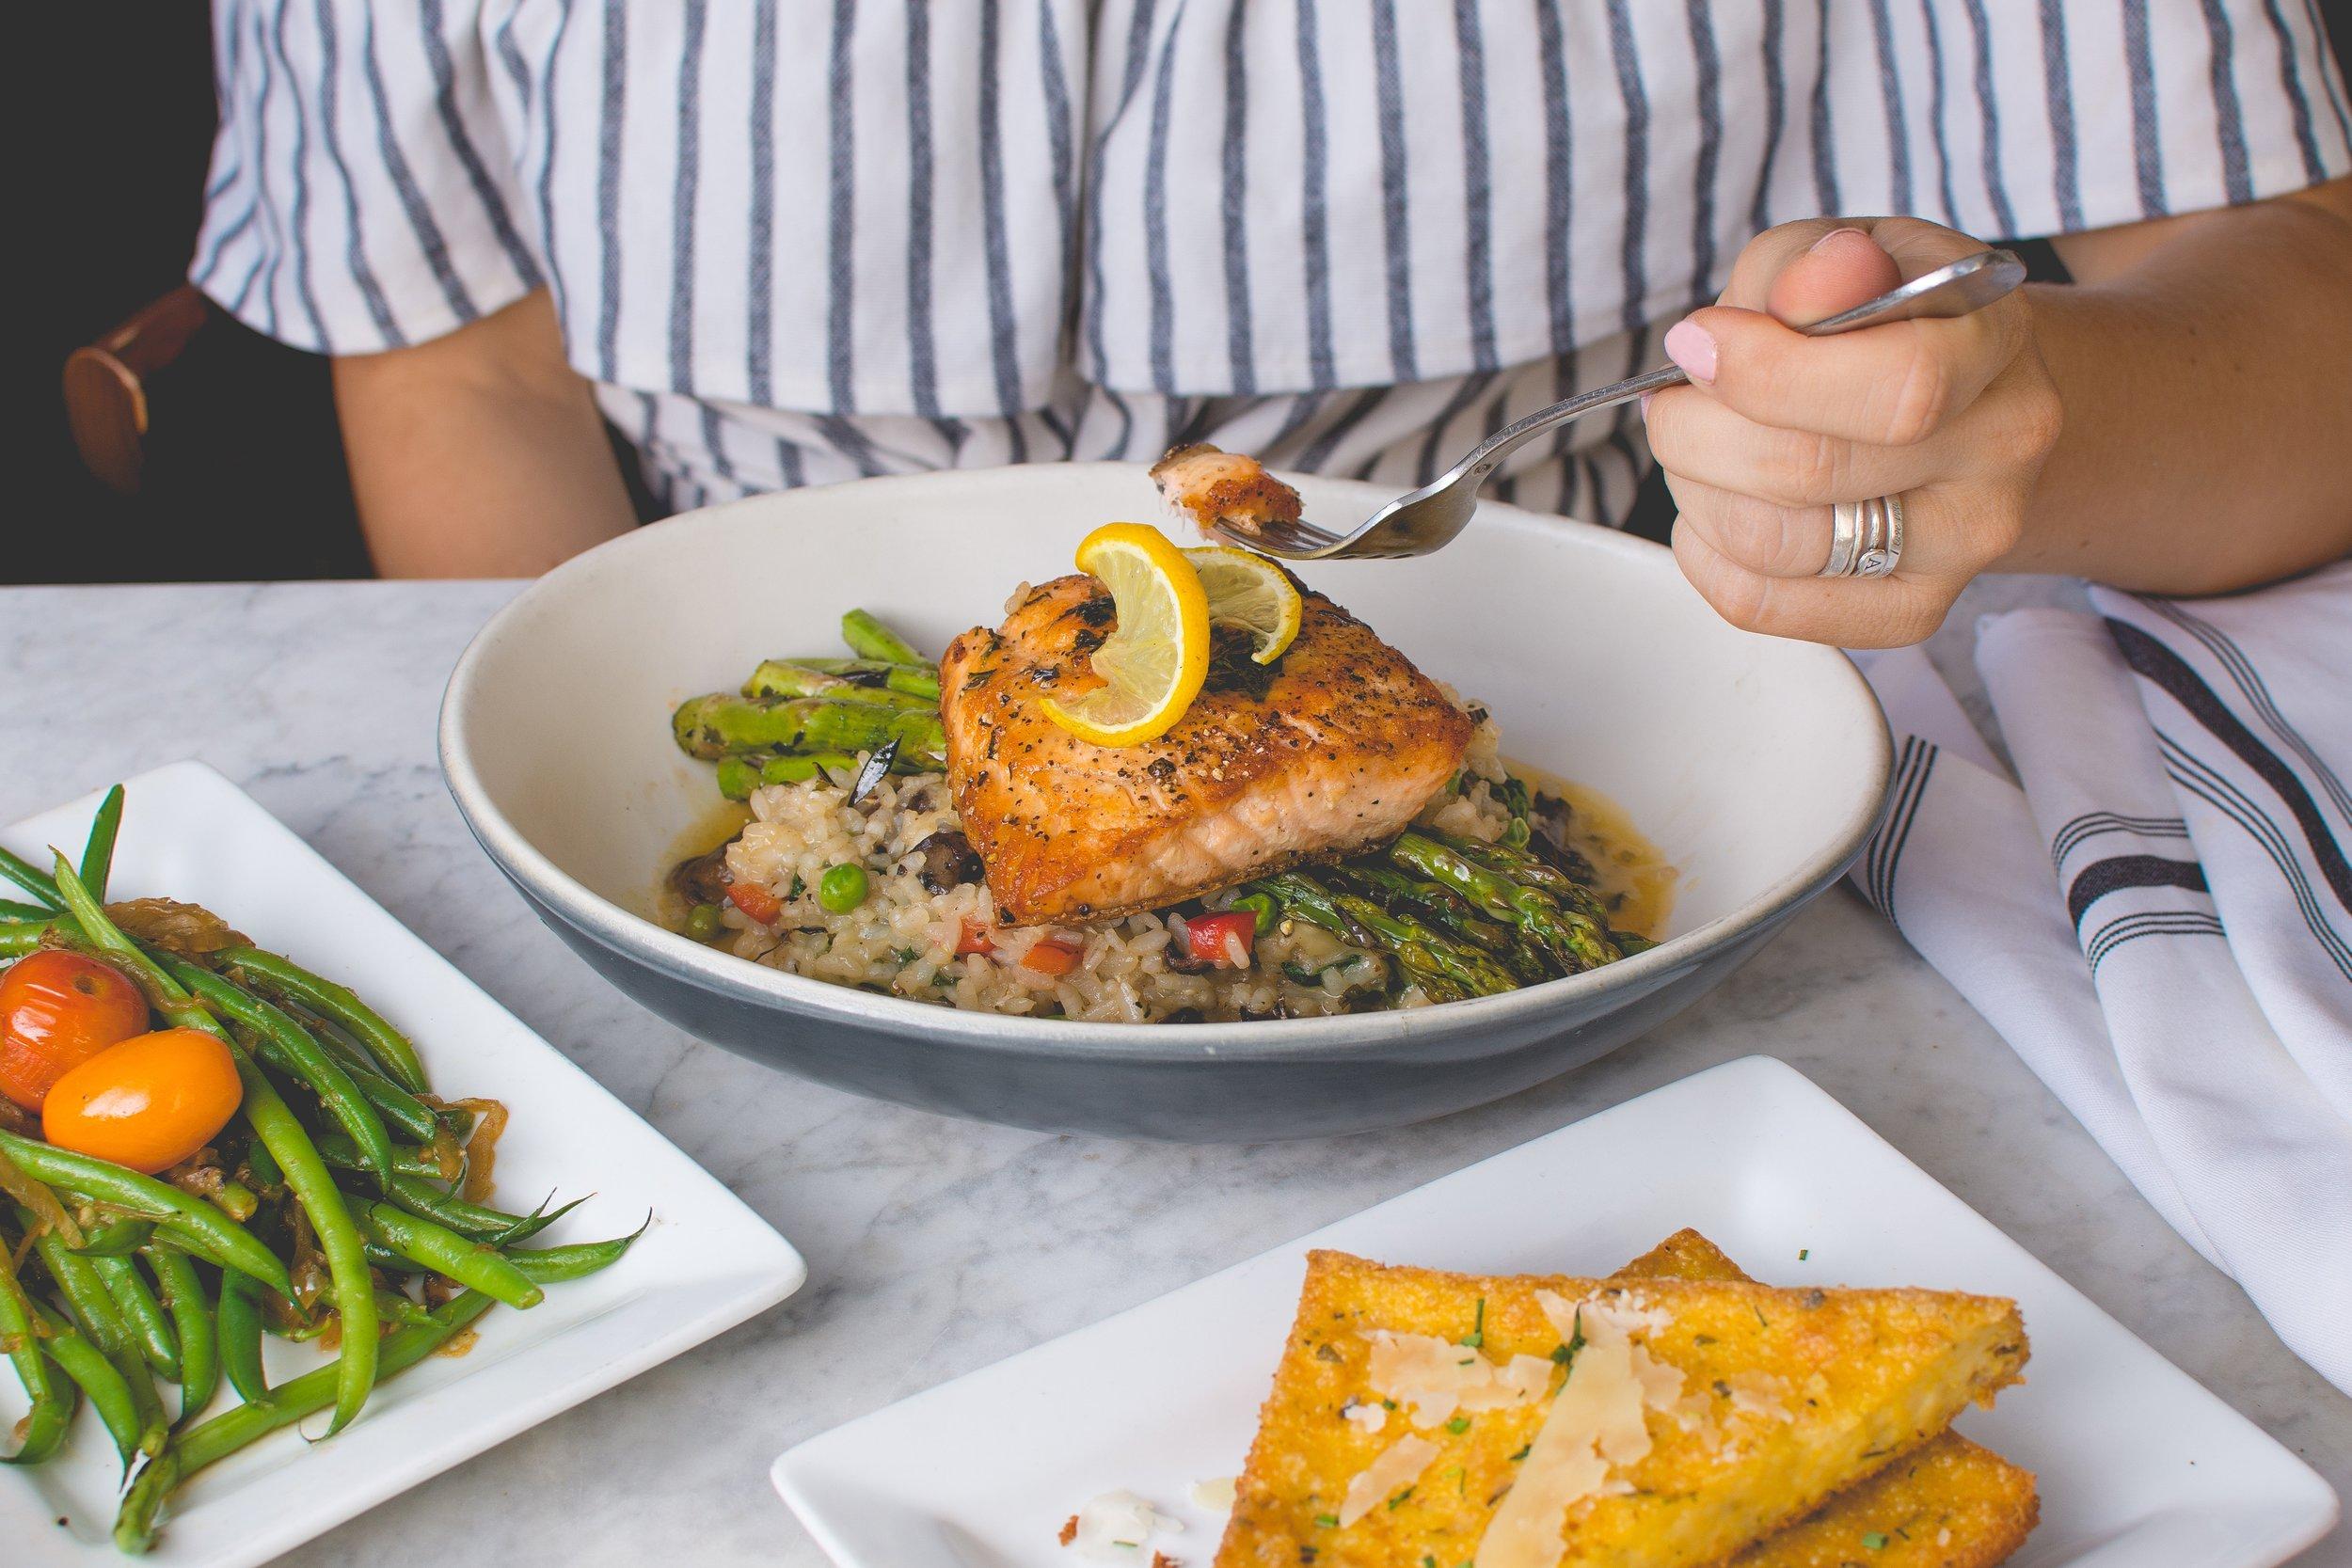 Plan Healthy, Balanced Meals - HEALTHY LIVING HABIT #7